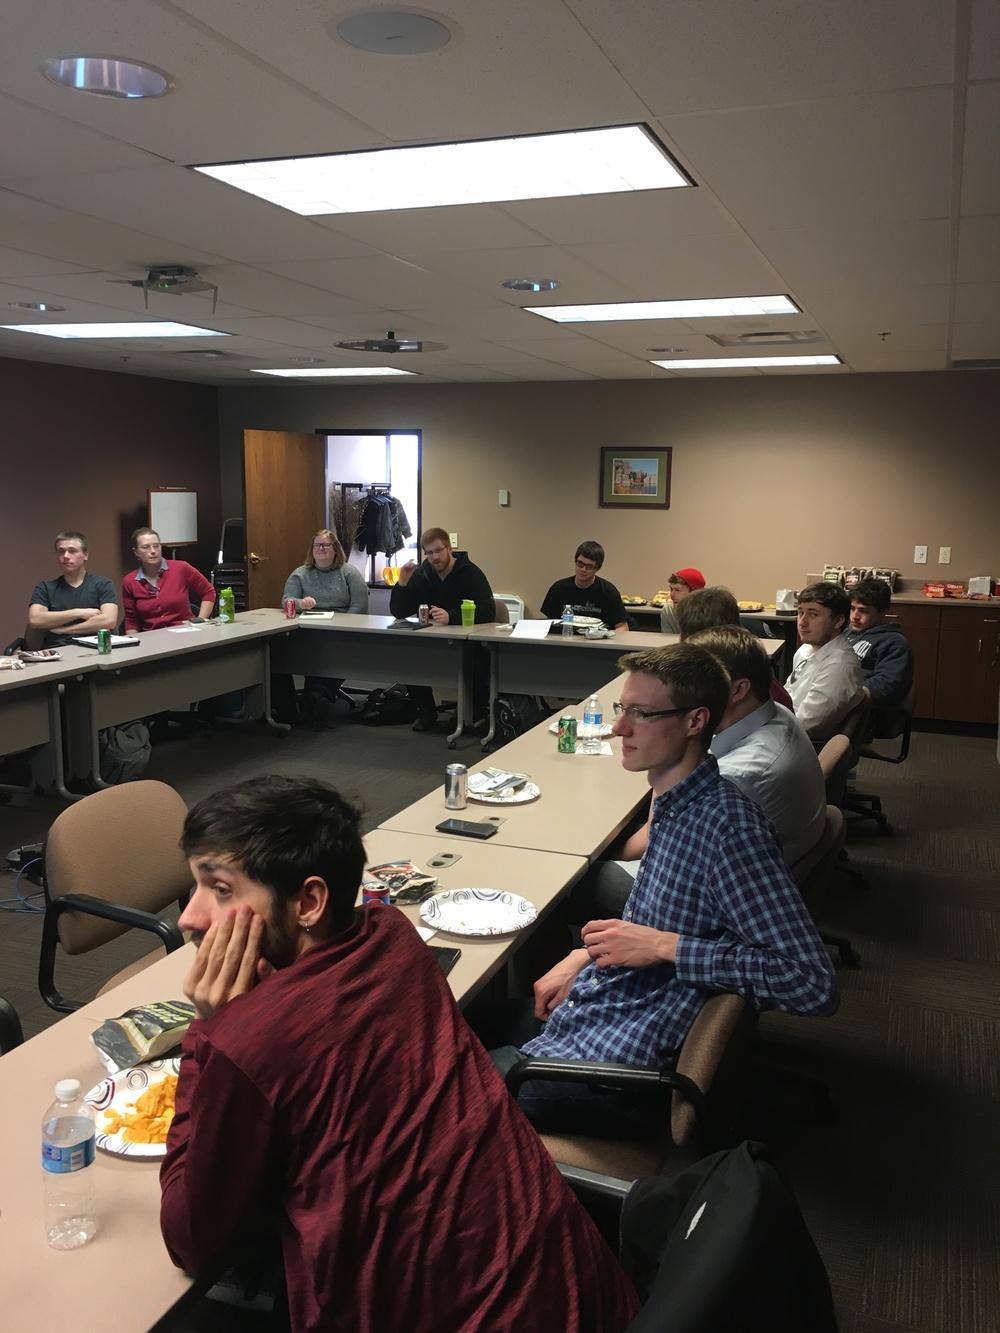 south-dakota-engineering-accelerator-giant-vision-meeting